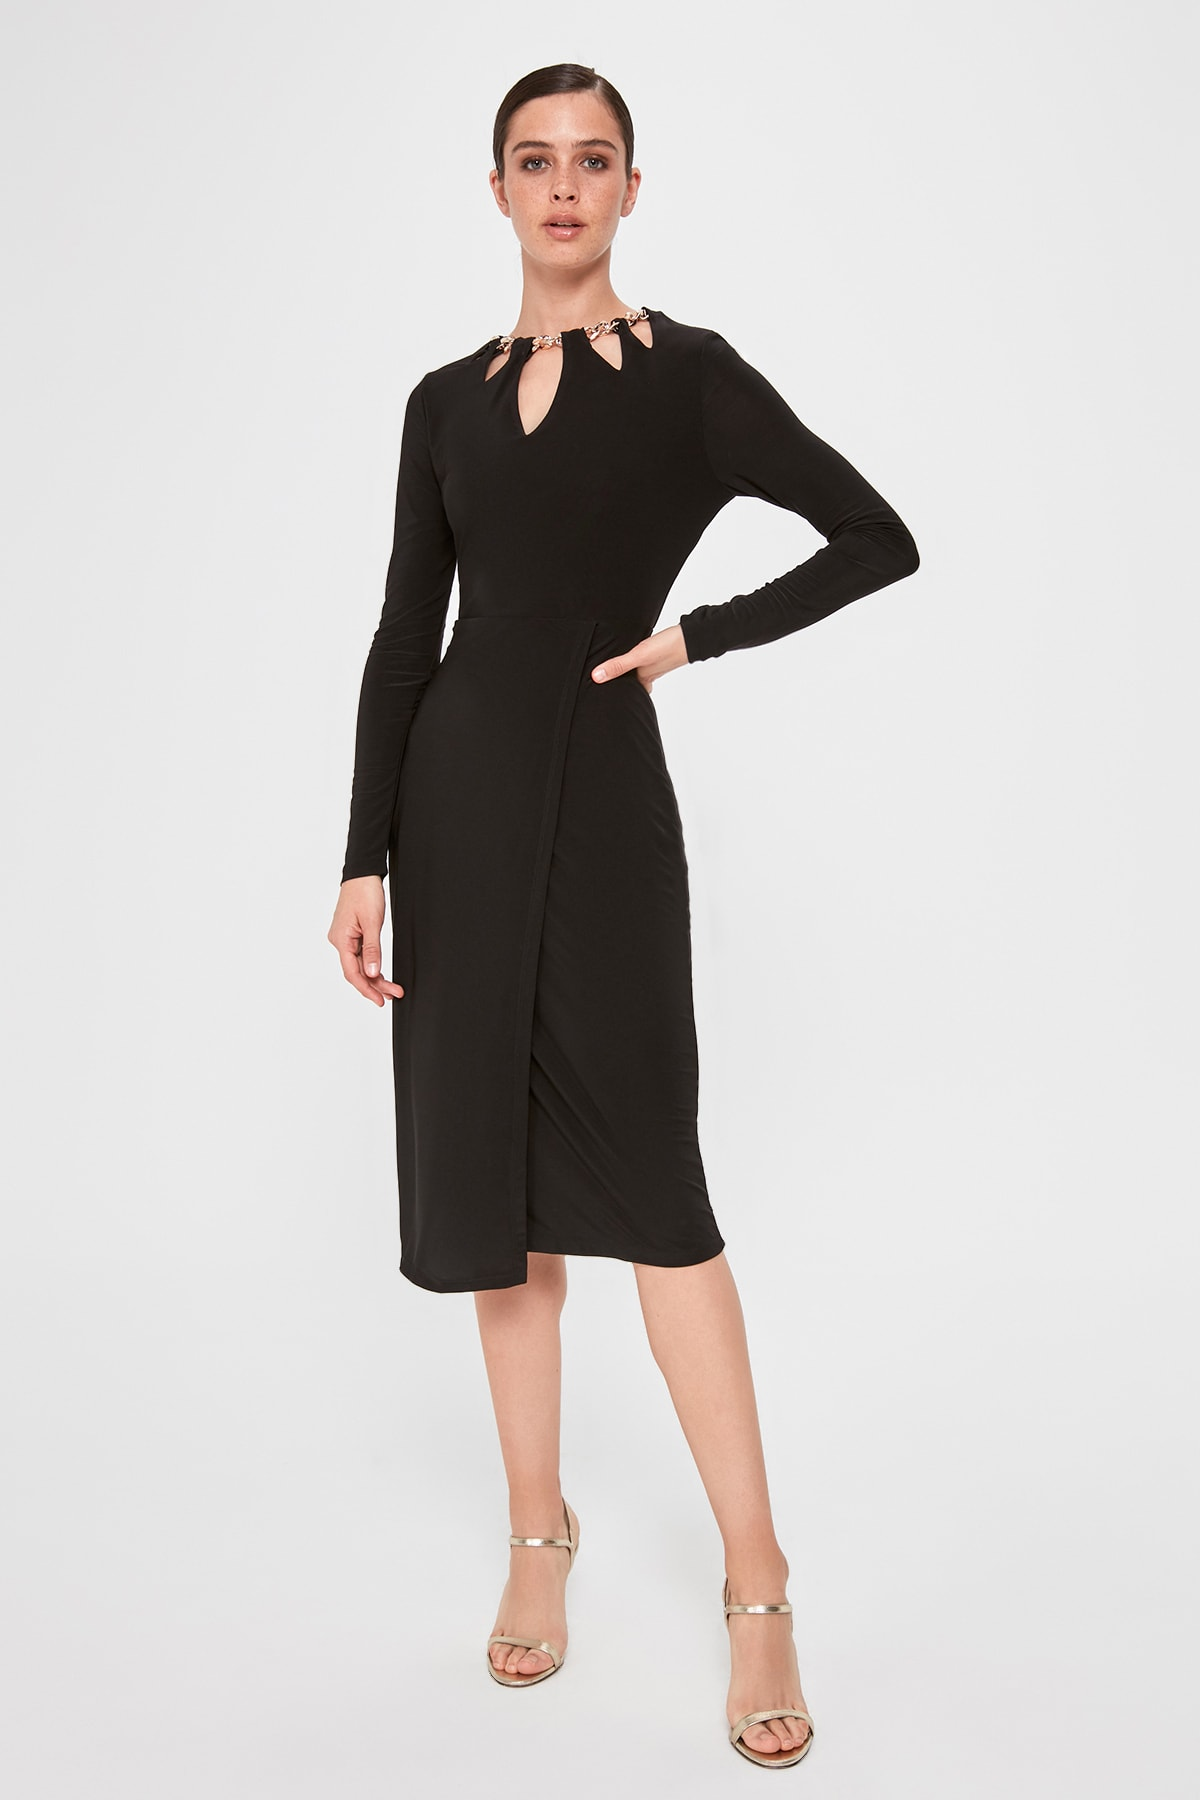 Trendyol Collar Detail Dress TPRAW20EL1498